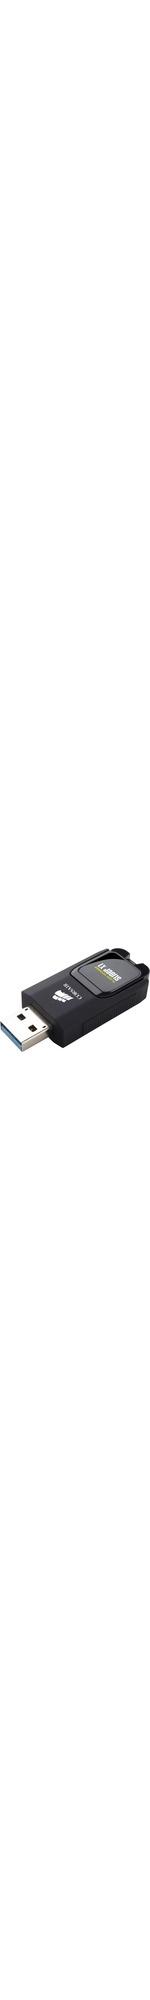 Corsair Flash Voyager Slider X1 32 GB USB 3.0 Flash Drive